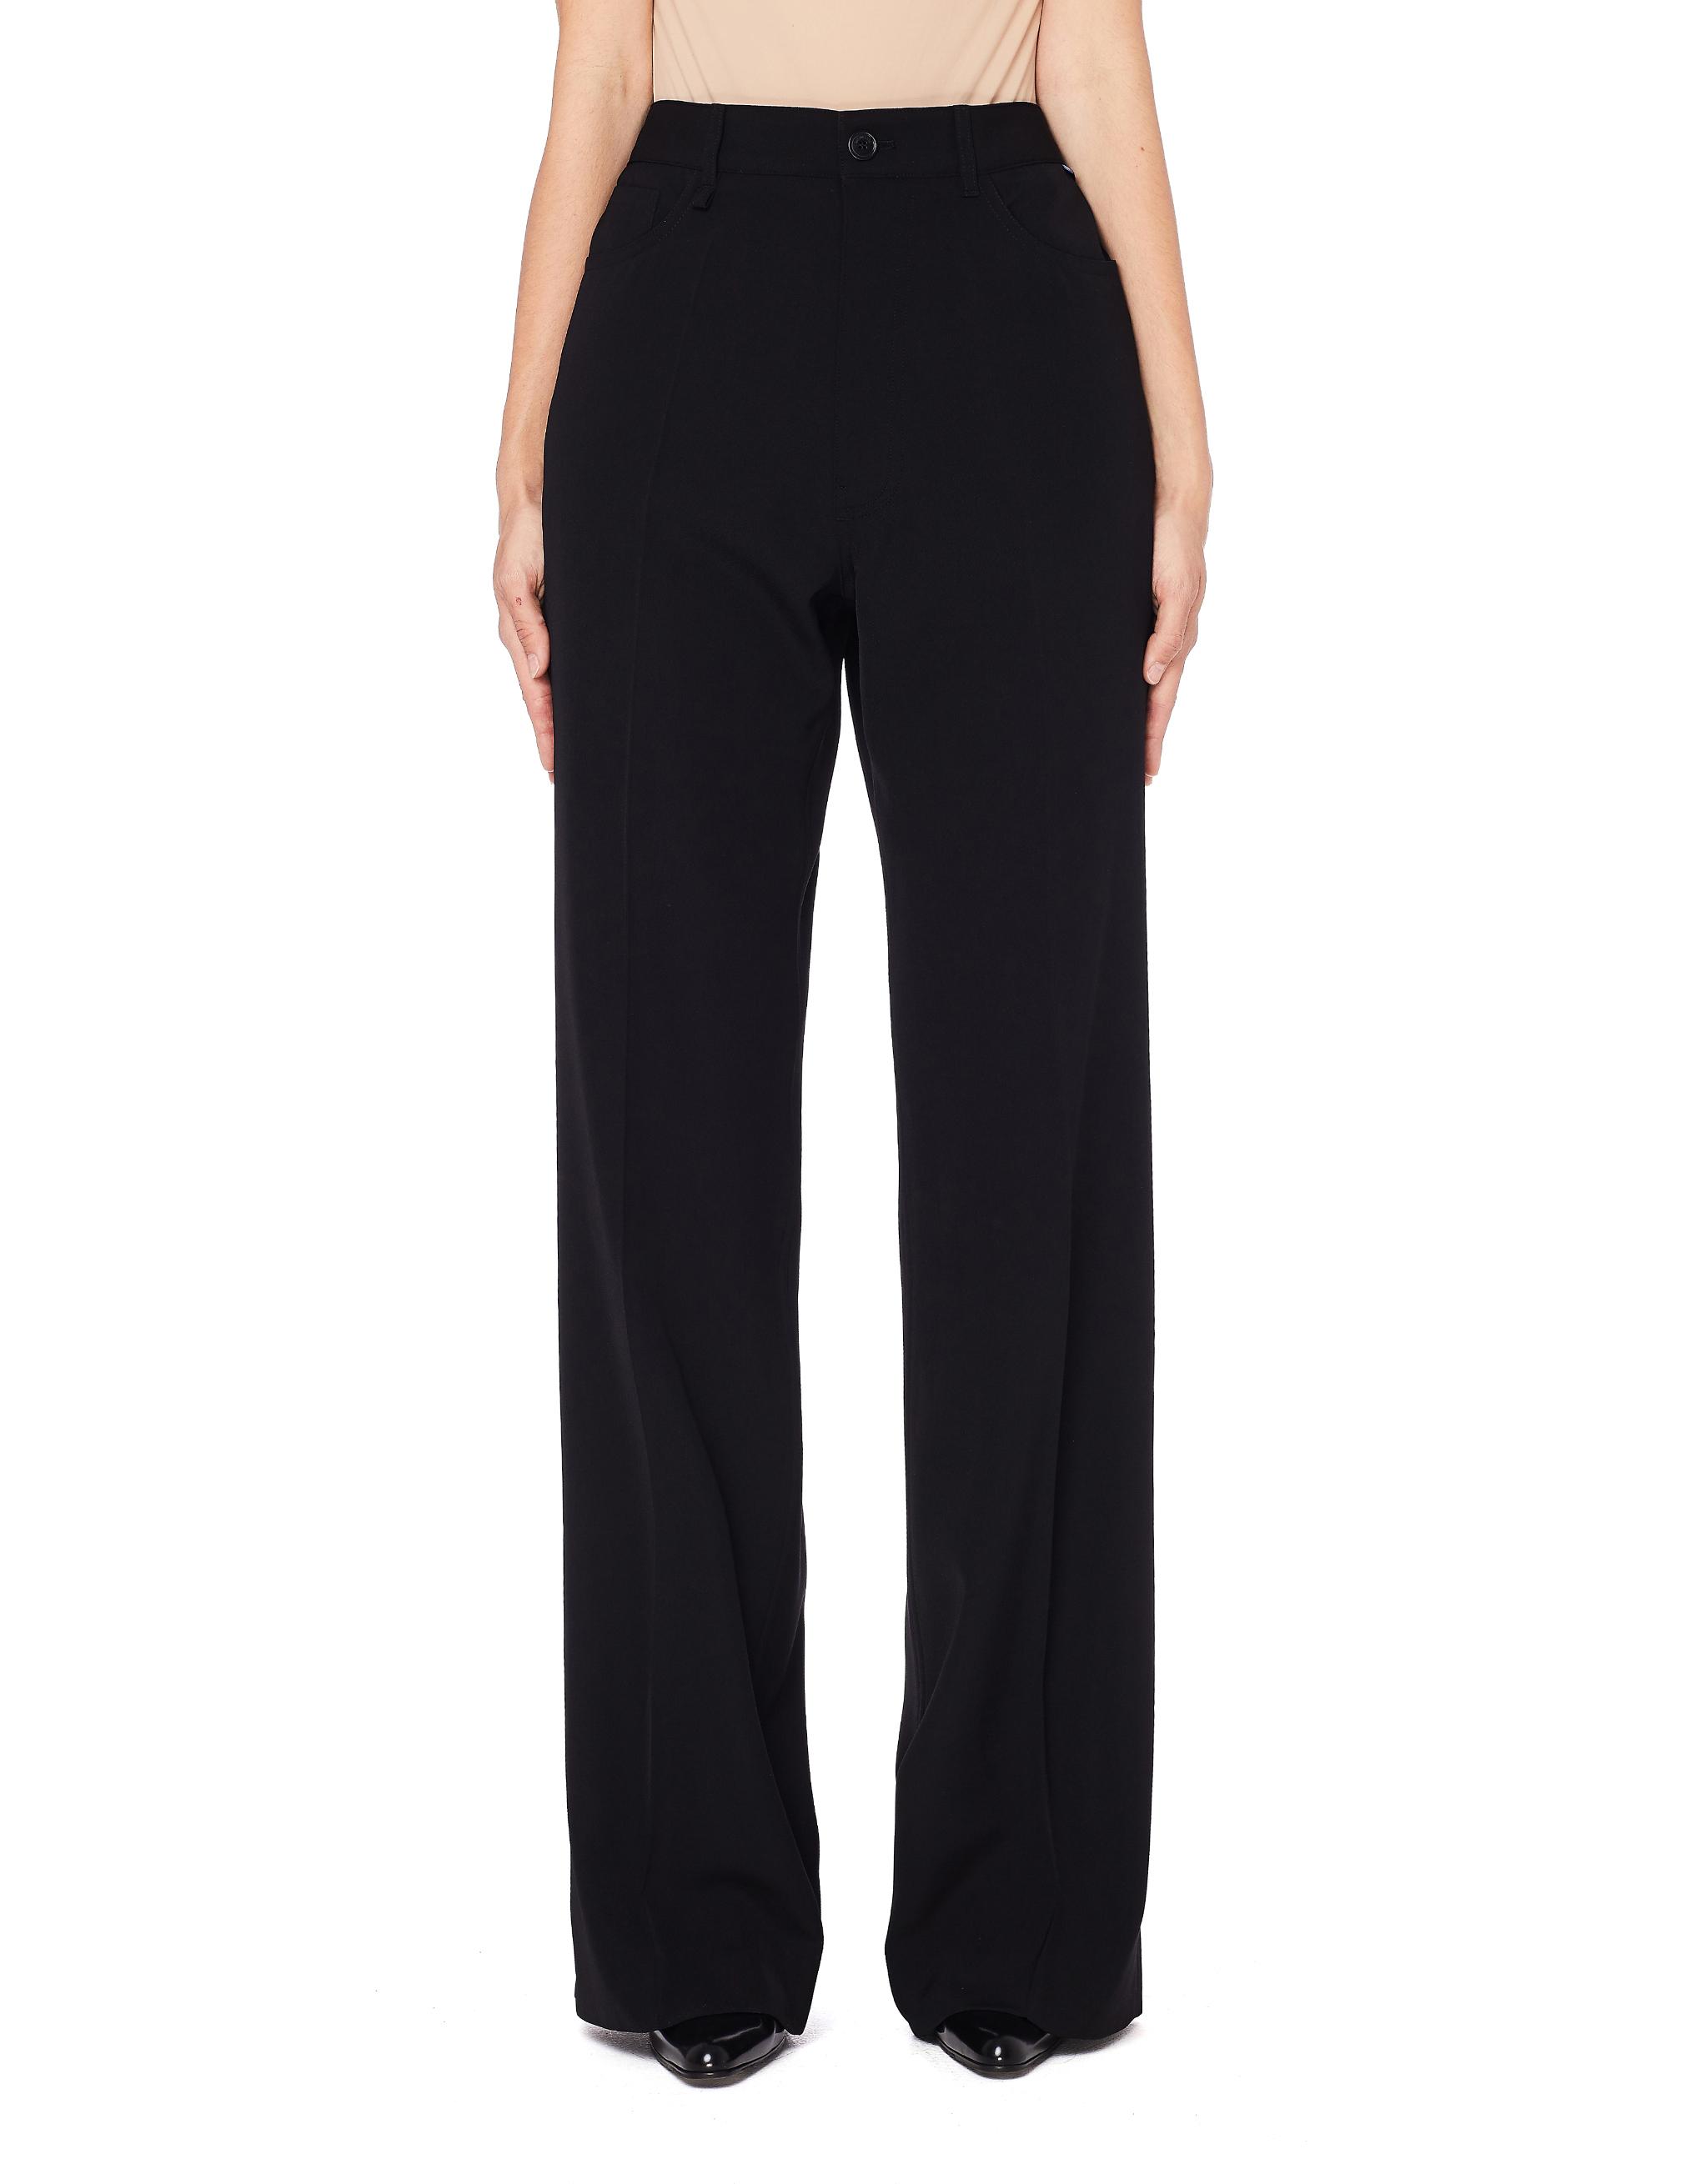 Balenciaga Black Pants